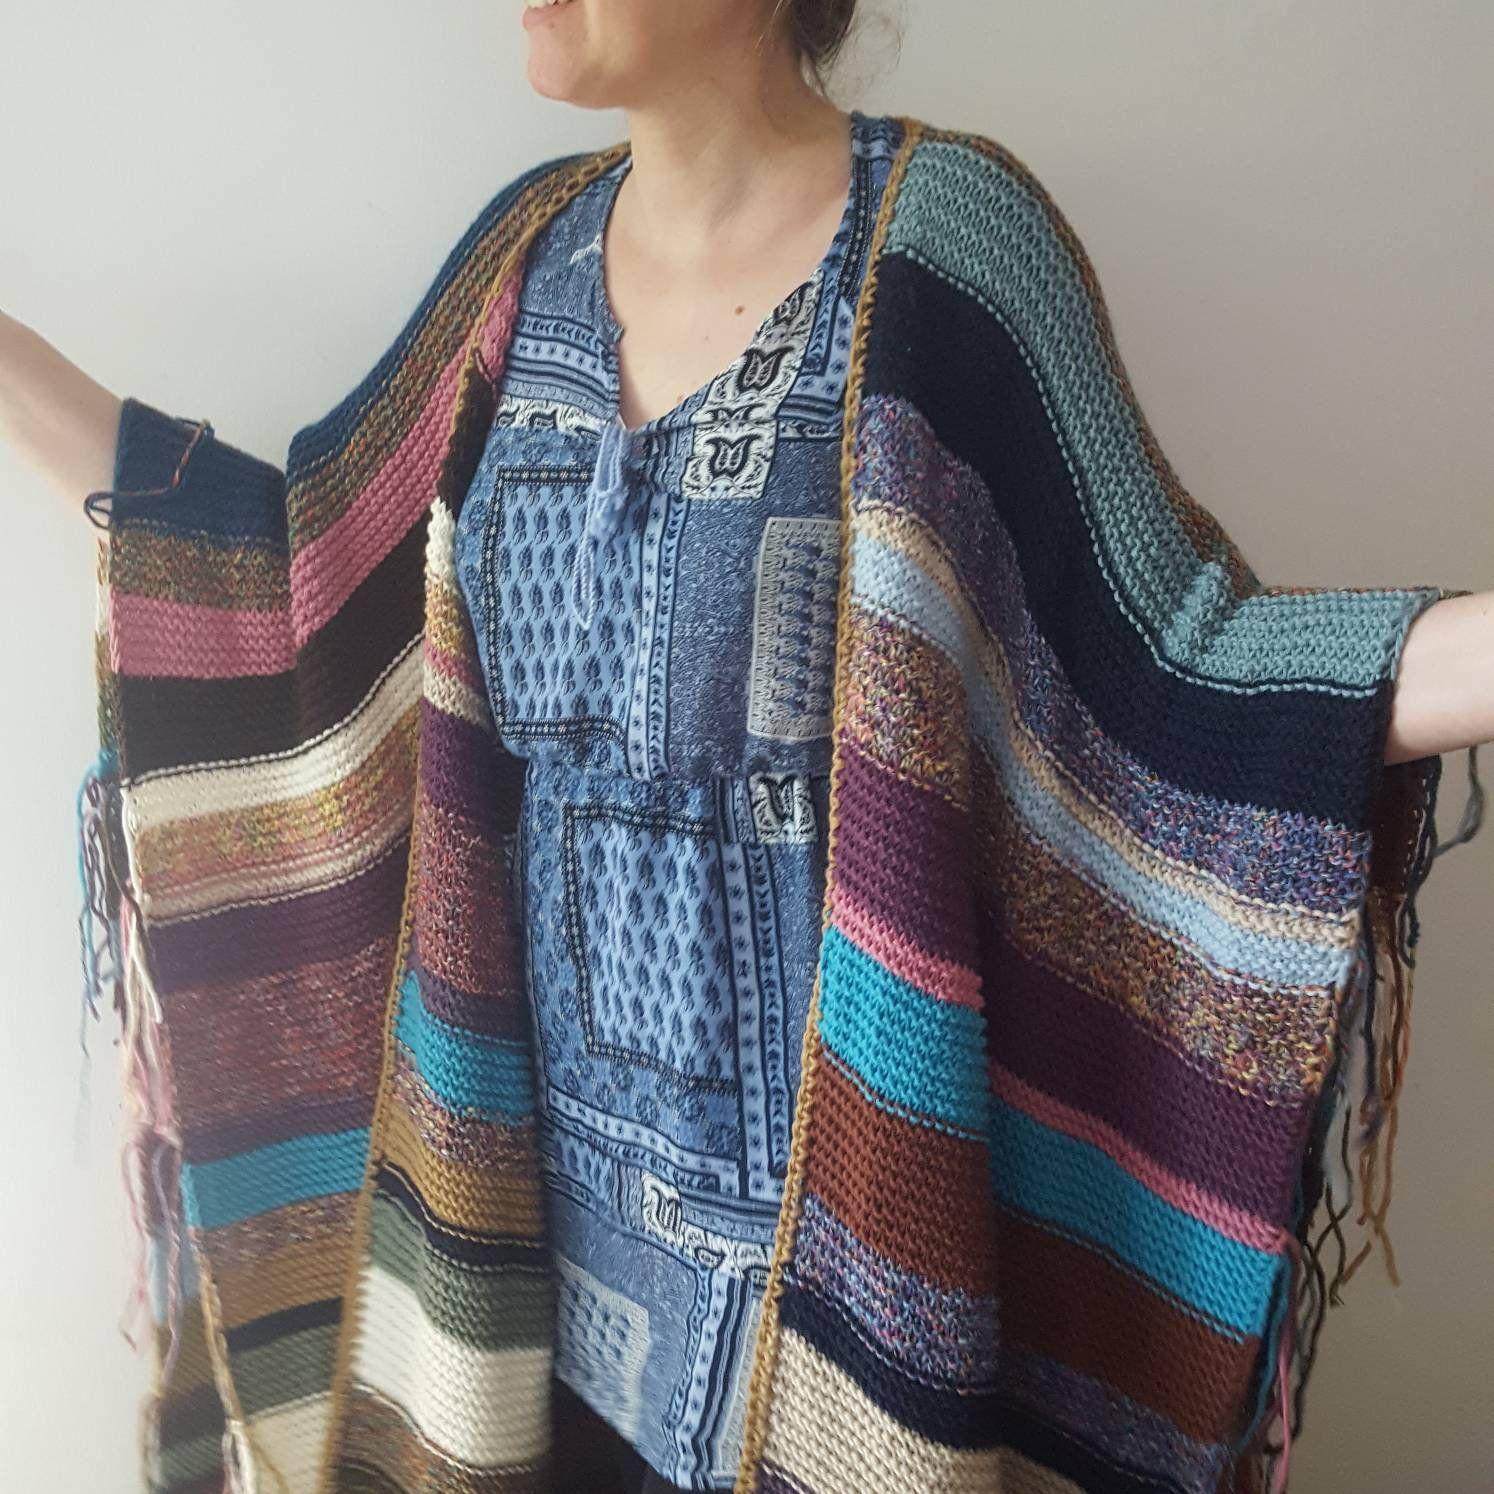 Poncho; Boho festival poncho; mexico poncho; poncho boho festival; knitwear; poncho knitted; made unique; knit gift; cozy; trend; knitwear #oversizedknitsweaters